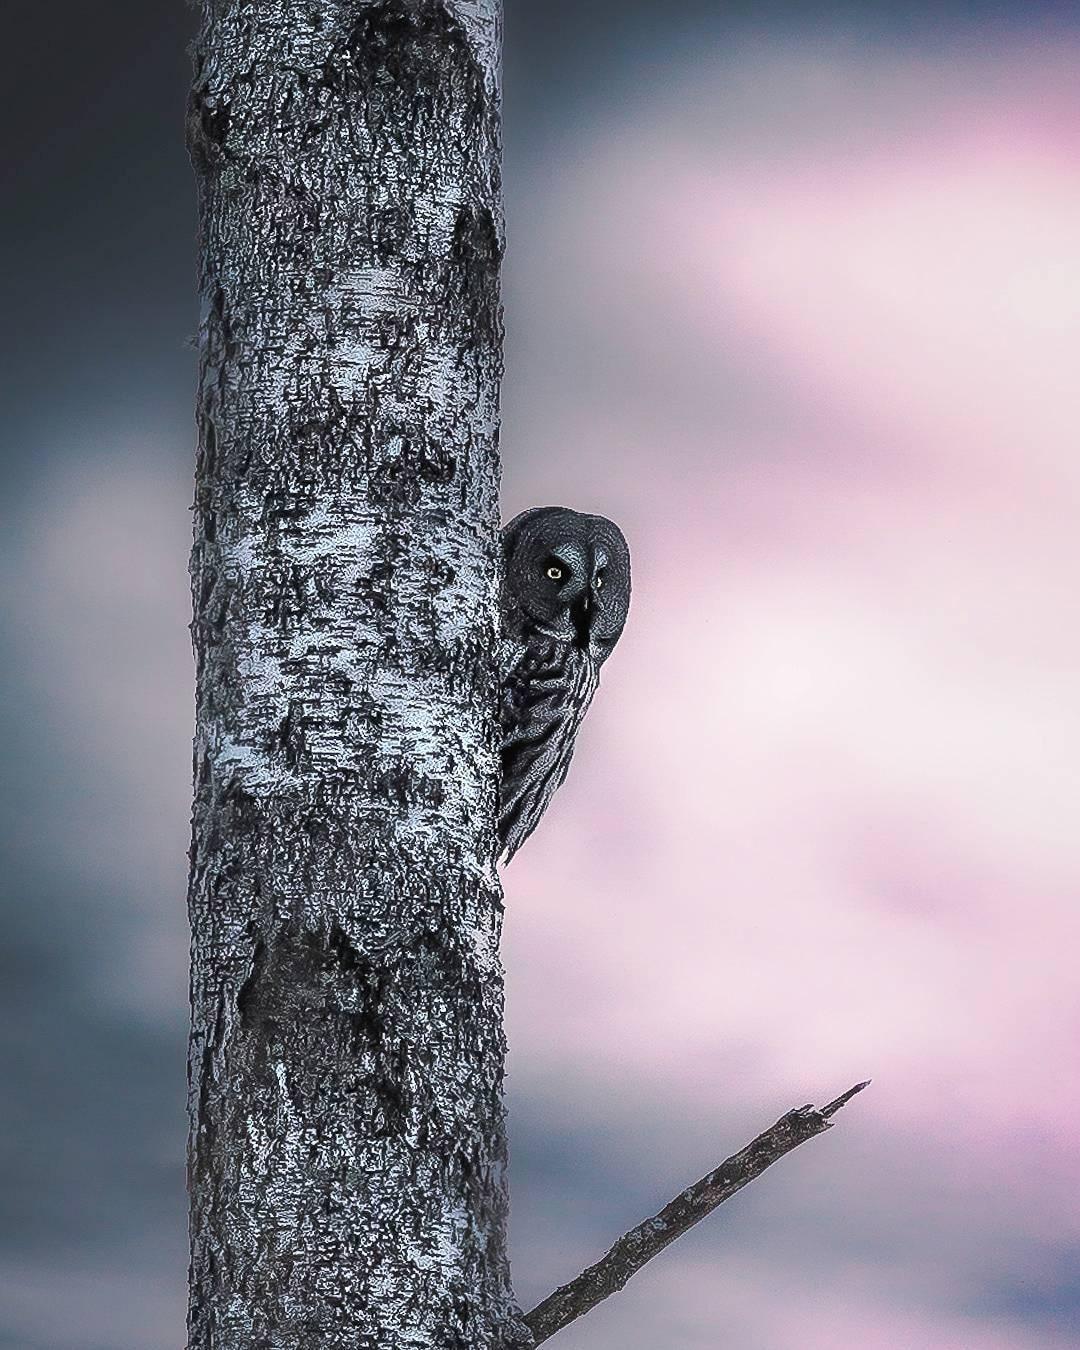 Photos of Forest Animals by Joachim Munter